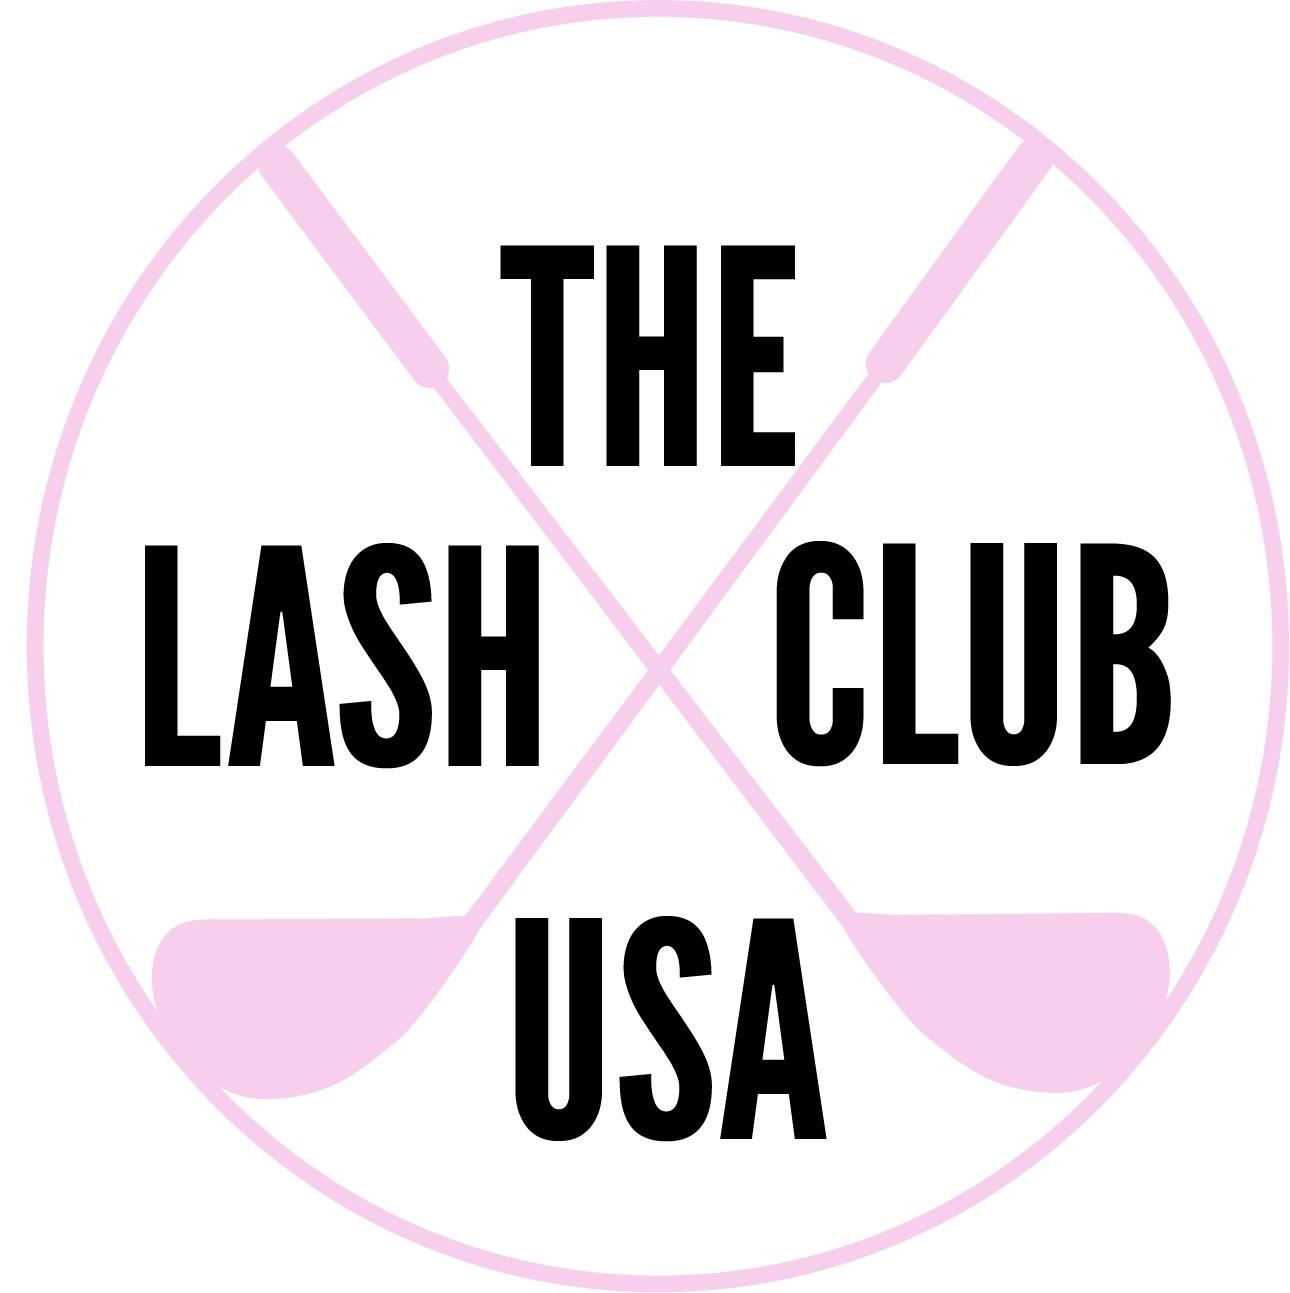 Navigate to the The Lash Club USA homepage